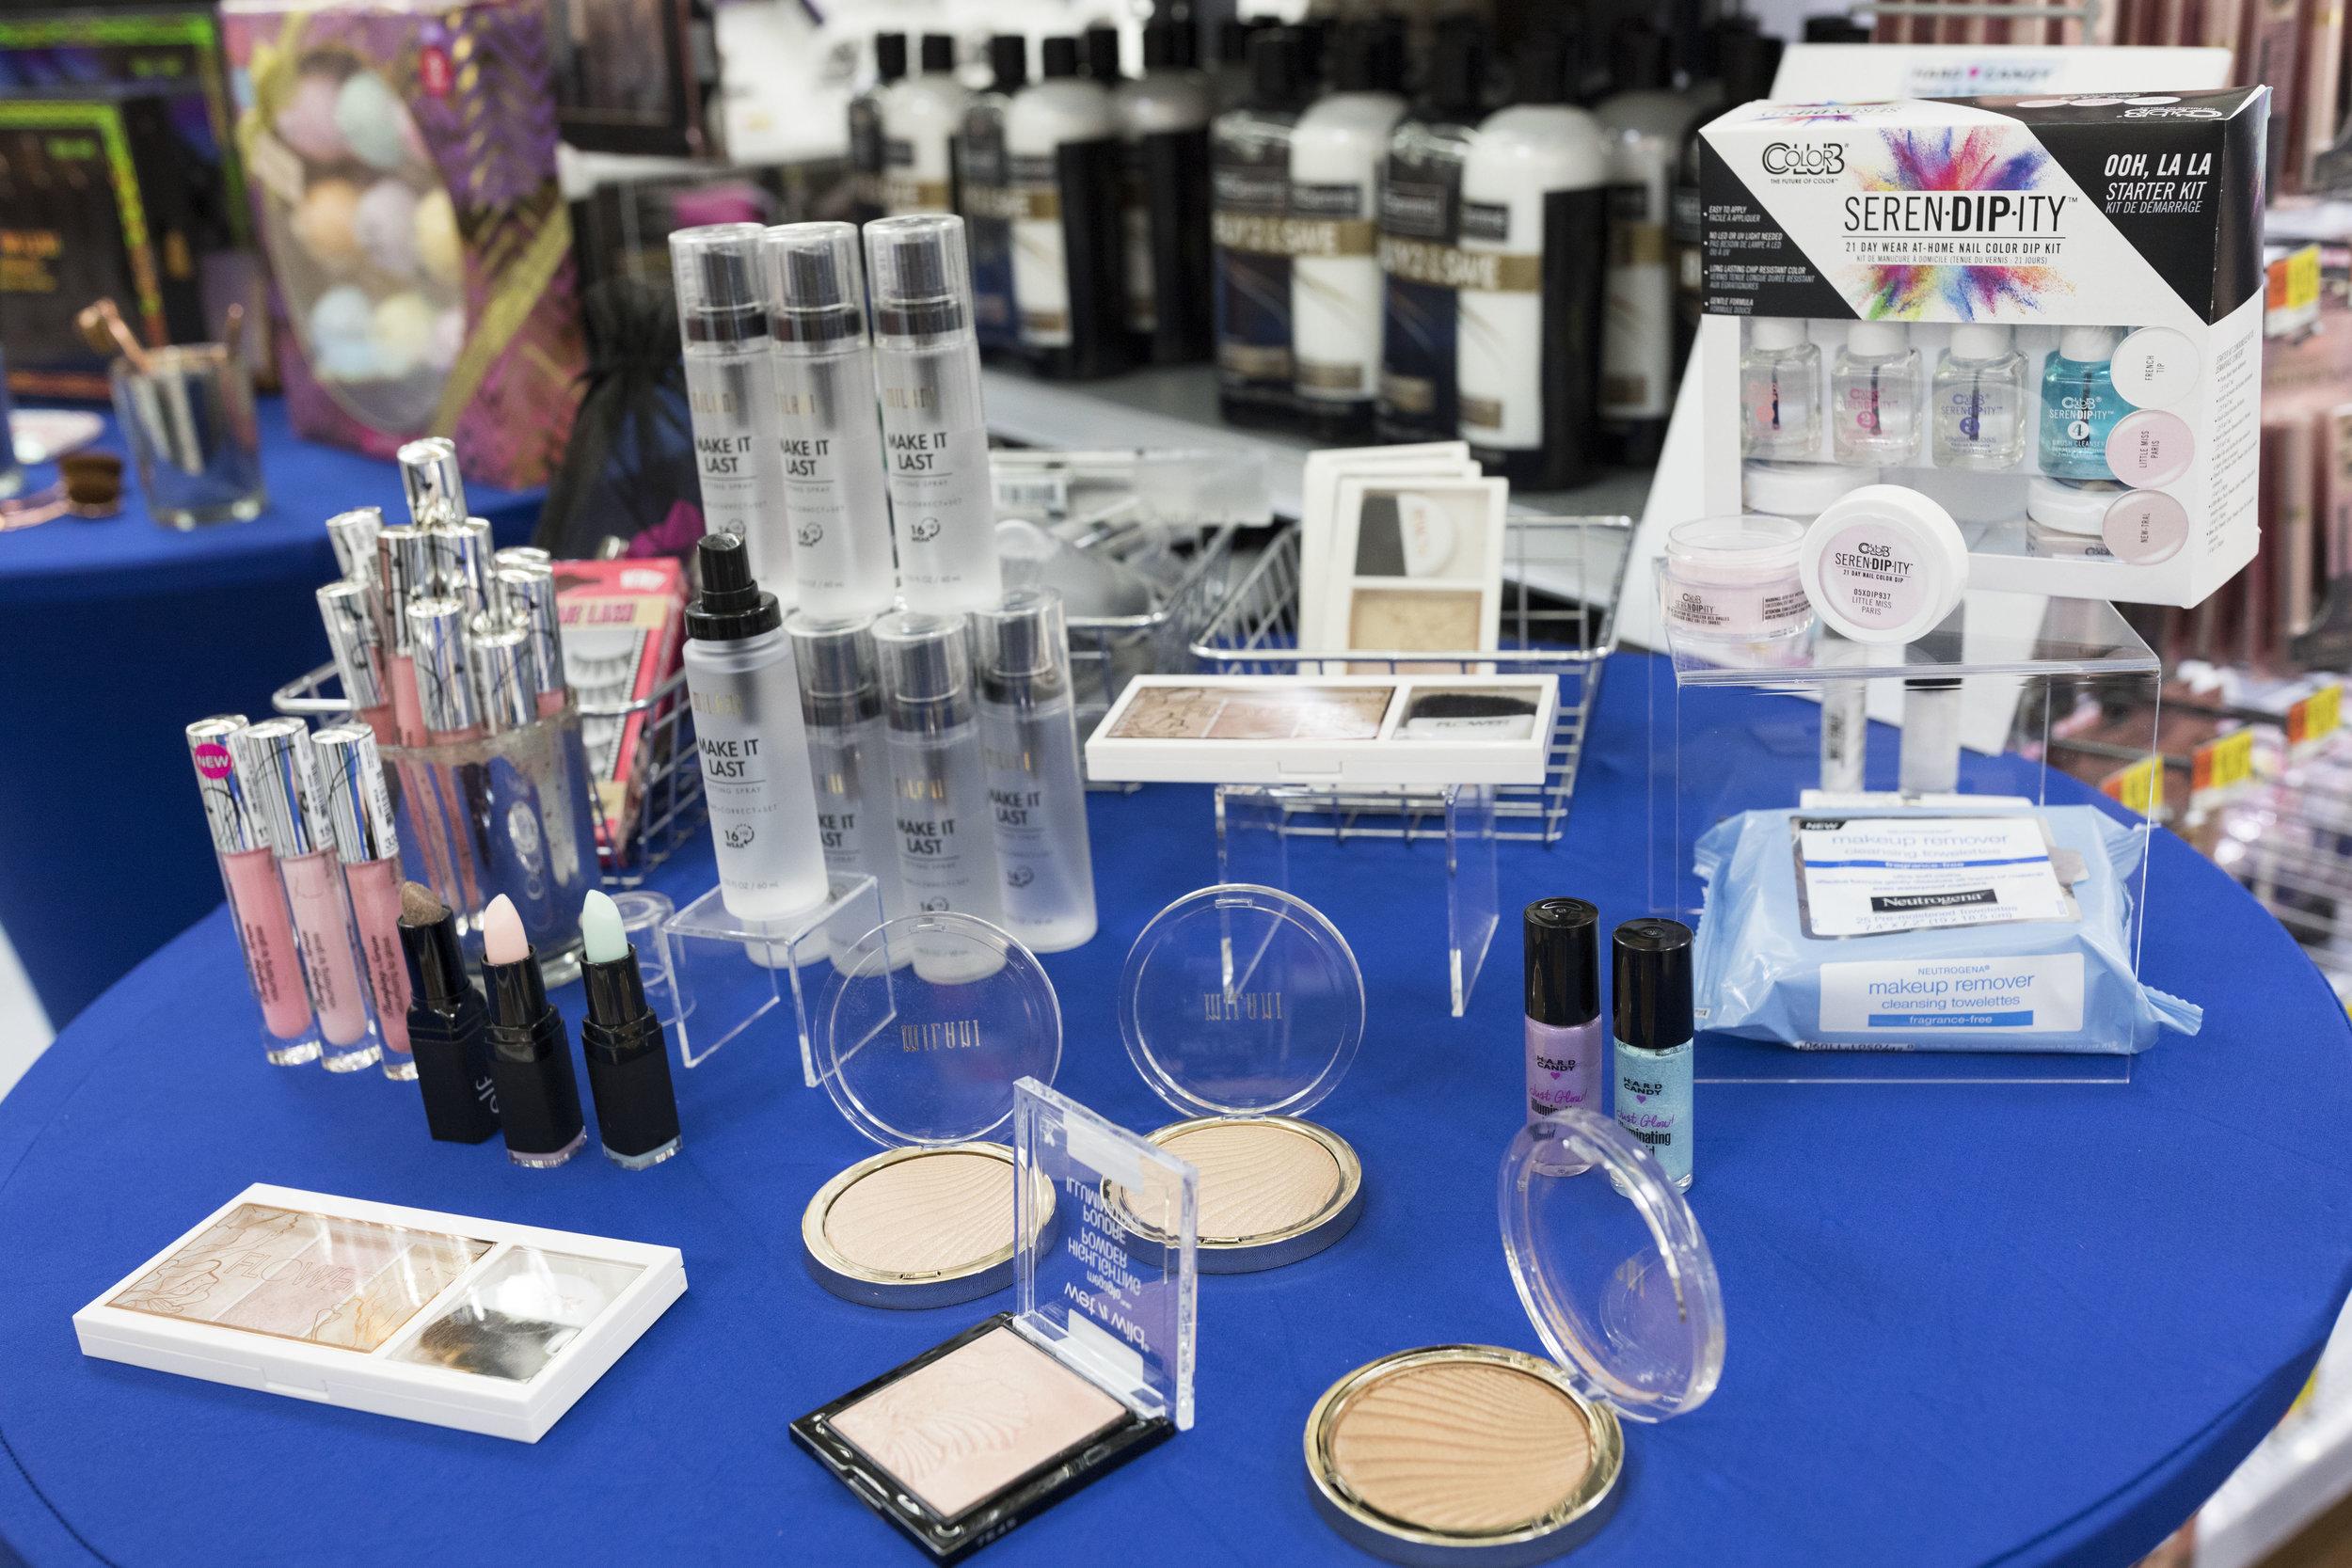 Walmart Fall Beauty Preview x Krity S x Milani Makeup